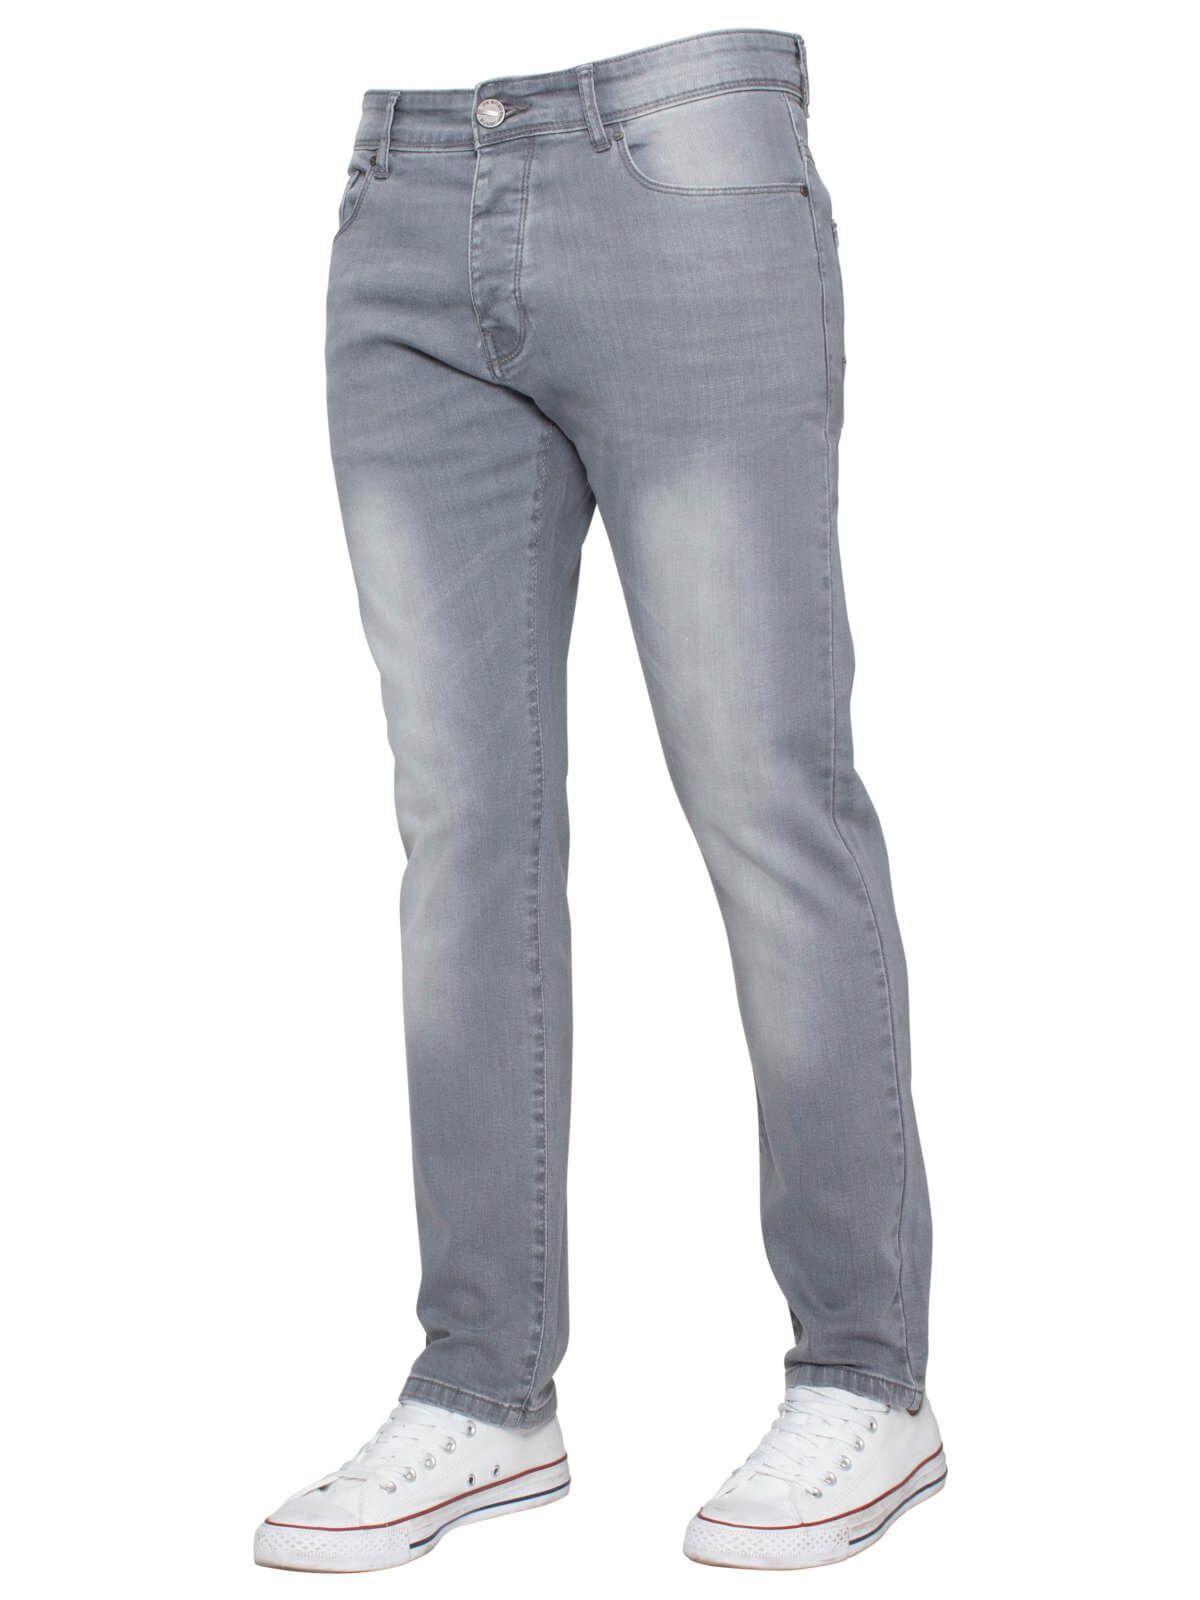 Mens Slim Stretch  Denim Jeans | Enzo Designer Menswear